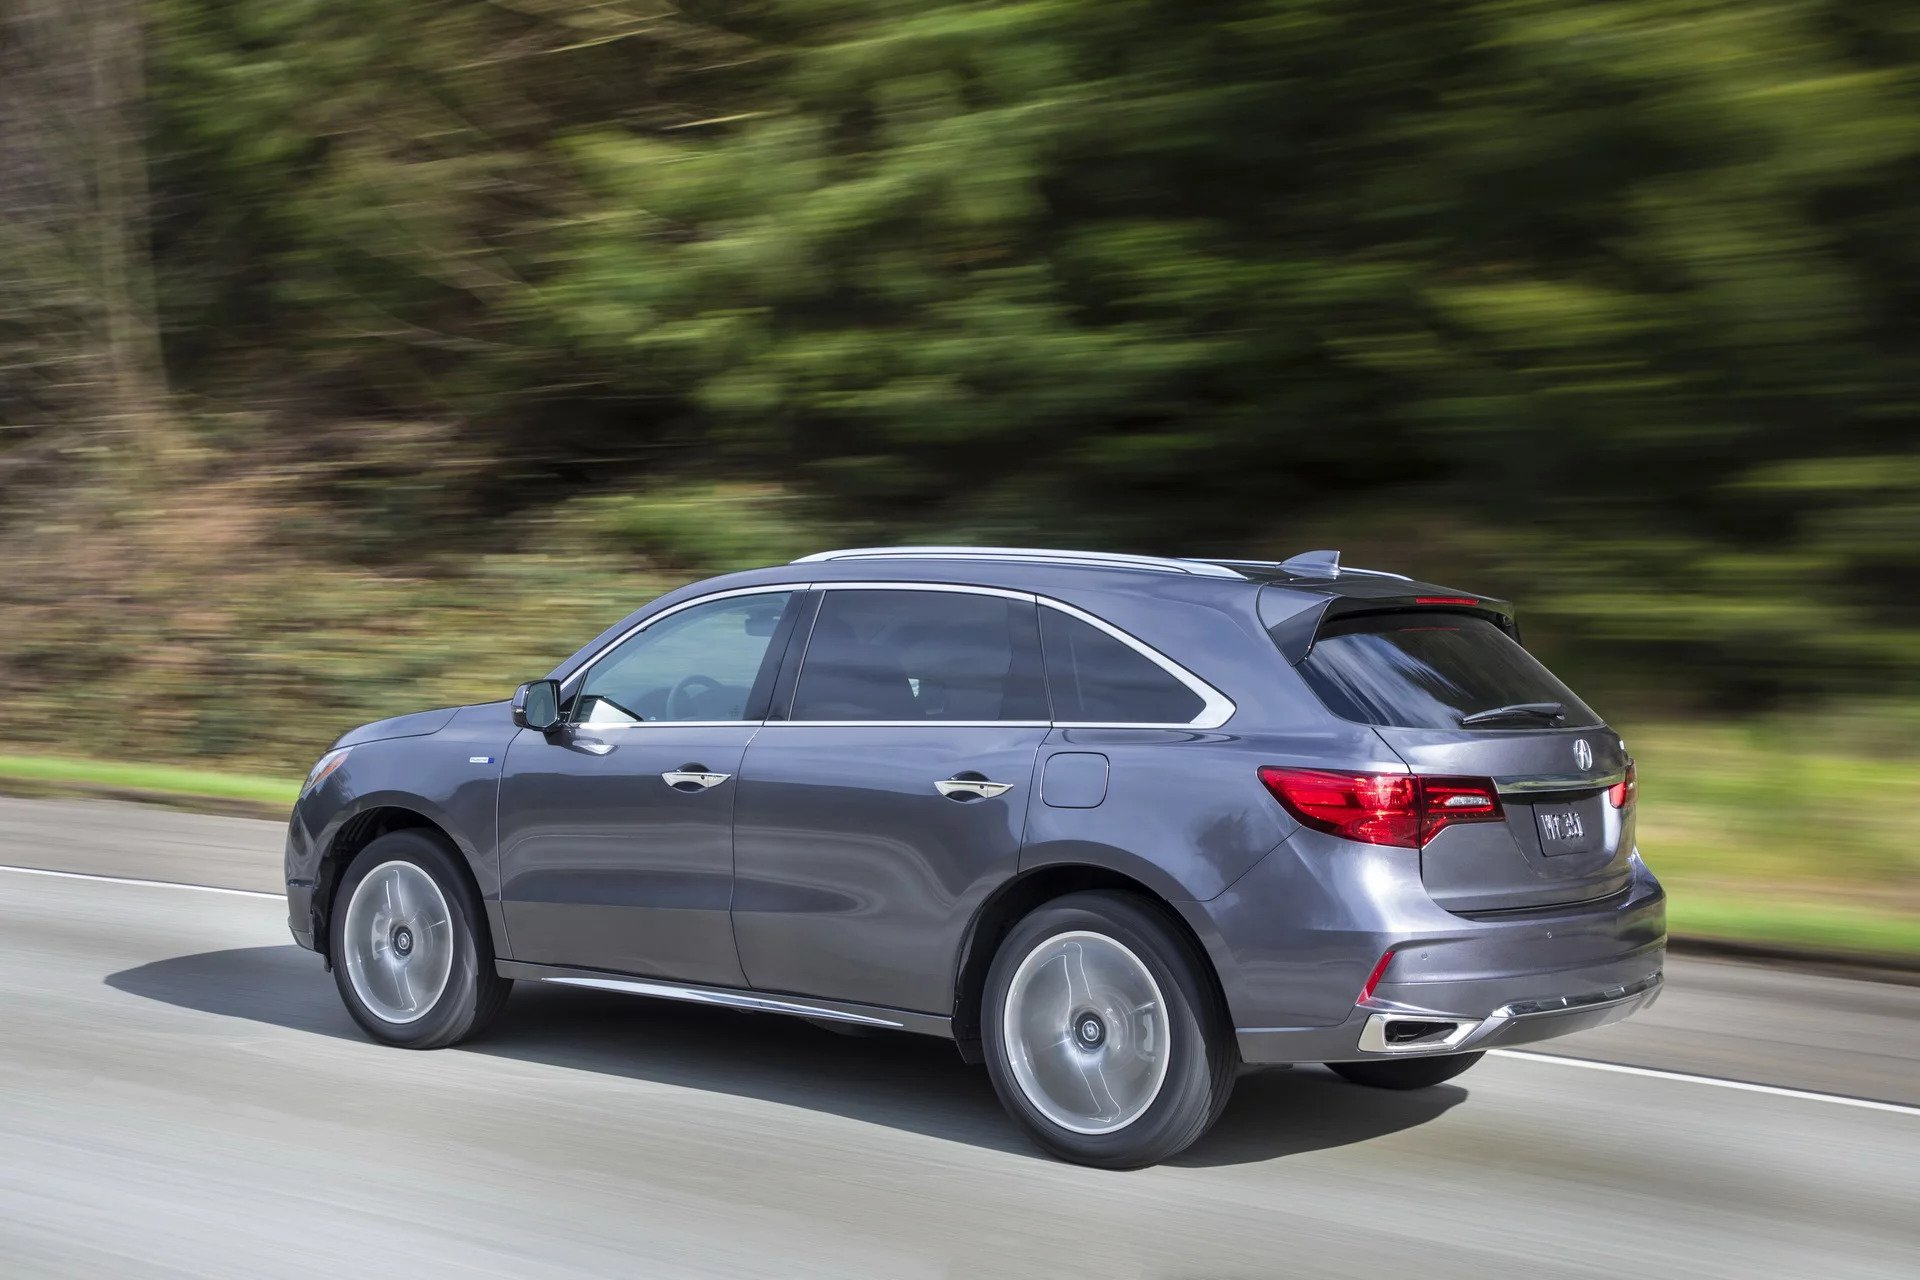 2019 Acura MDX Sport Hybrid Priced At $52,800 - autoevolution